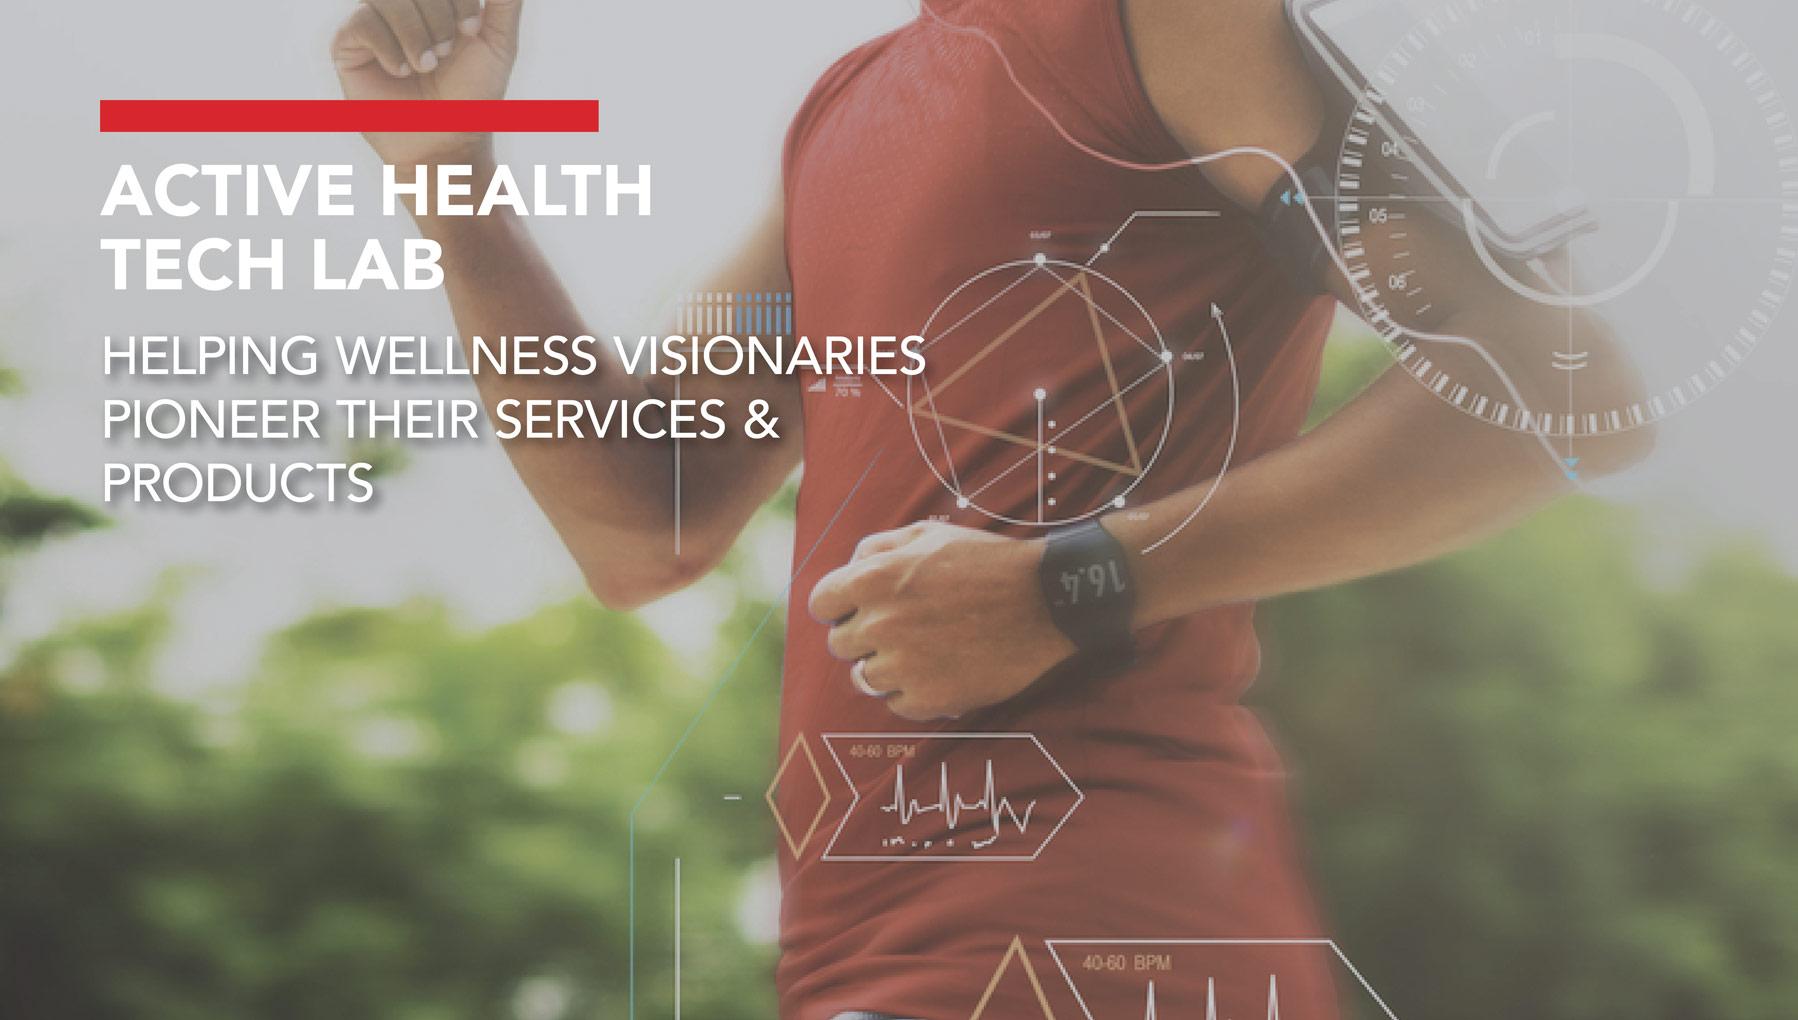 Active Health Tech Lab